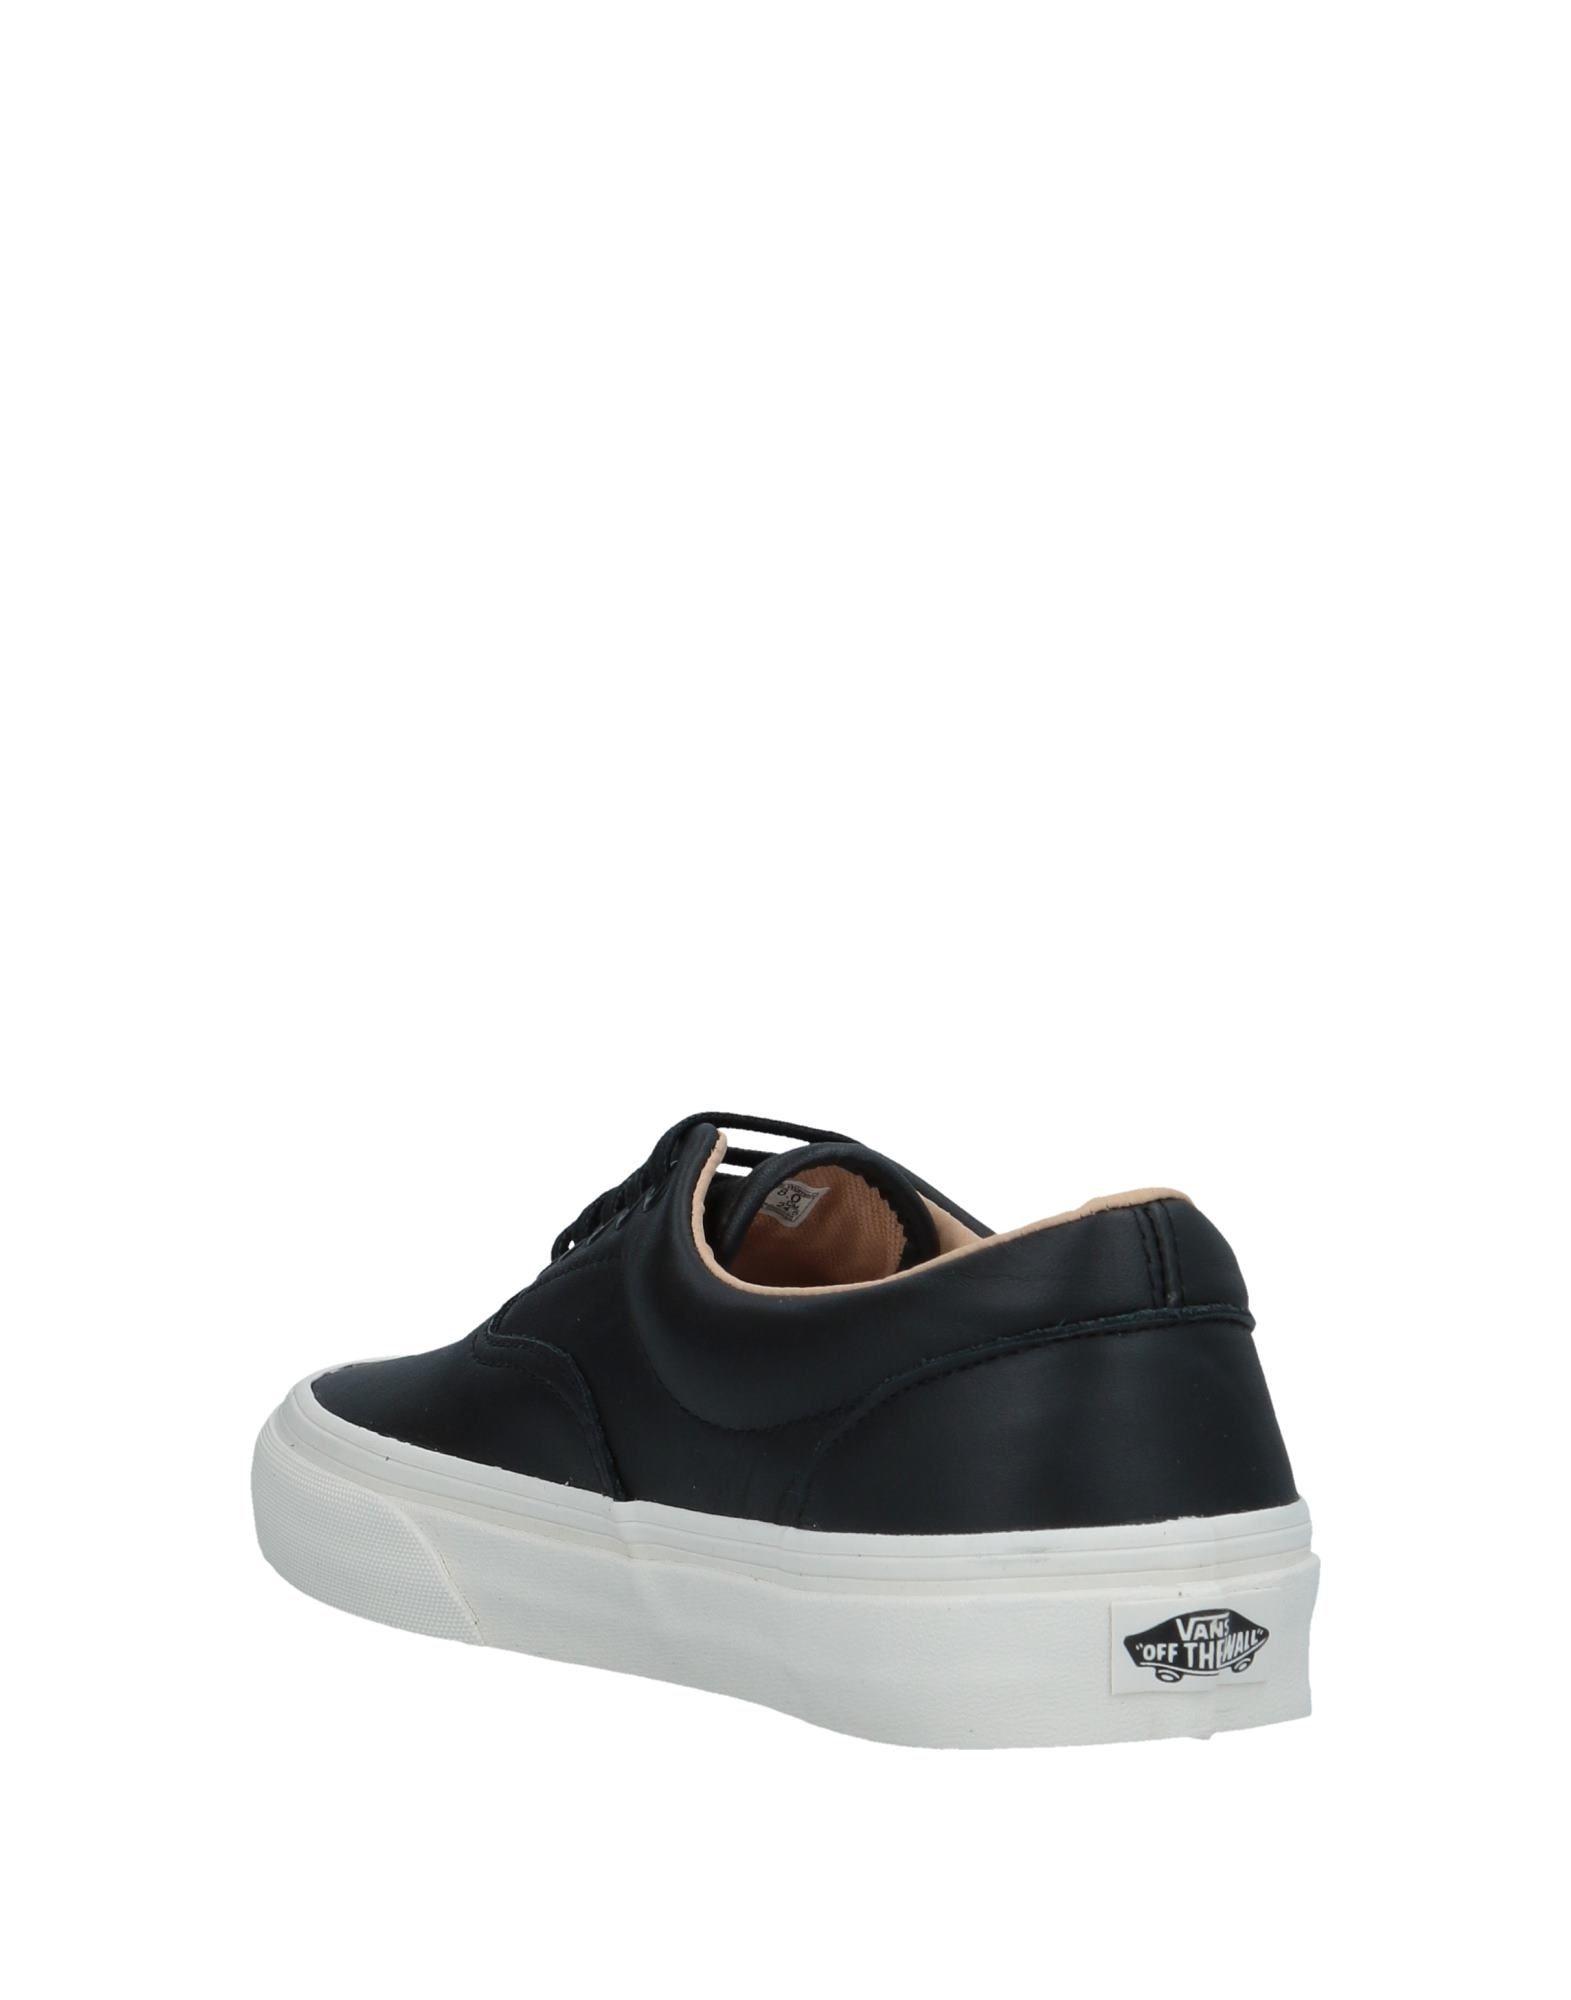 Vans Sneakers Gute Damen  11508557NN Gute Sneakers Qualität beliebte Schuhe 396f10